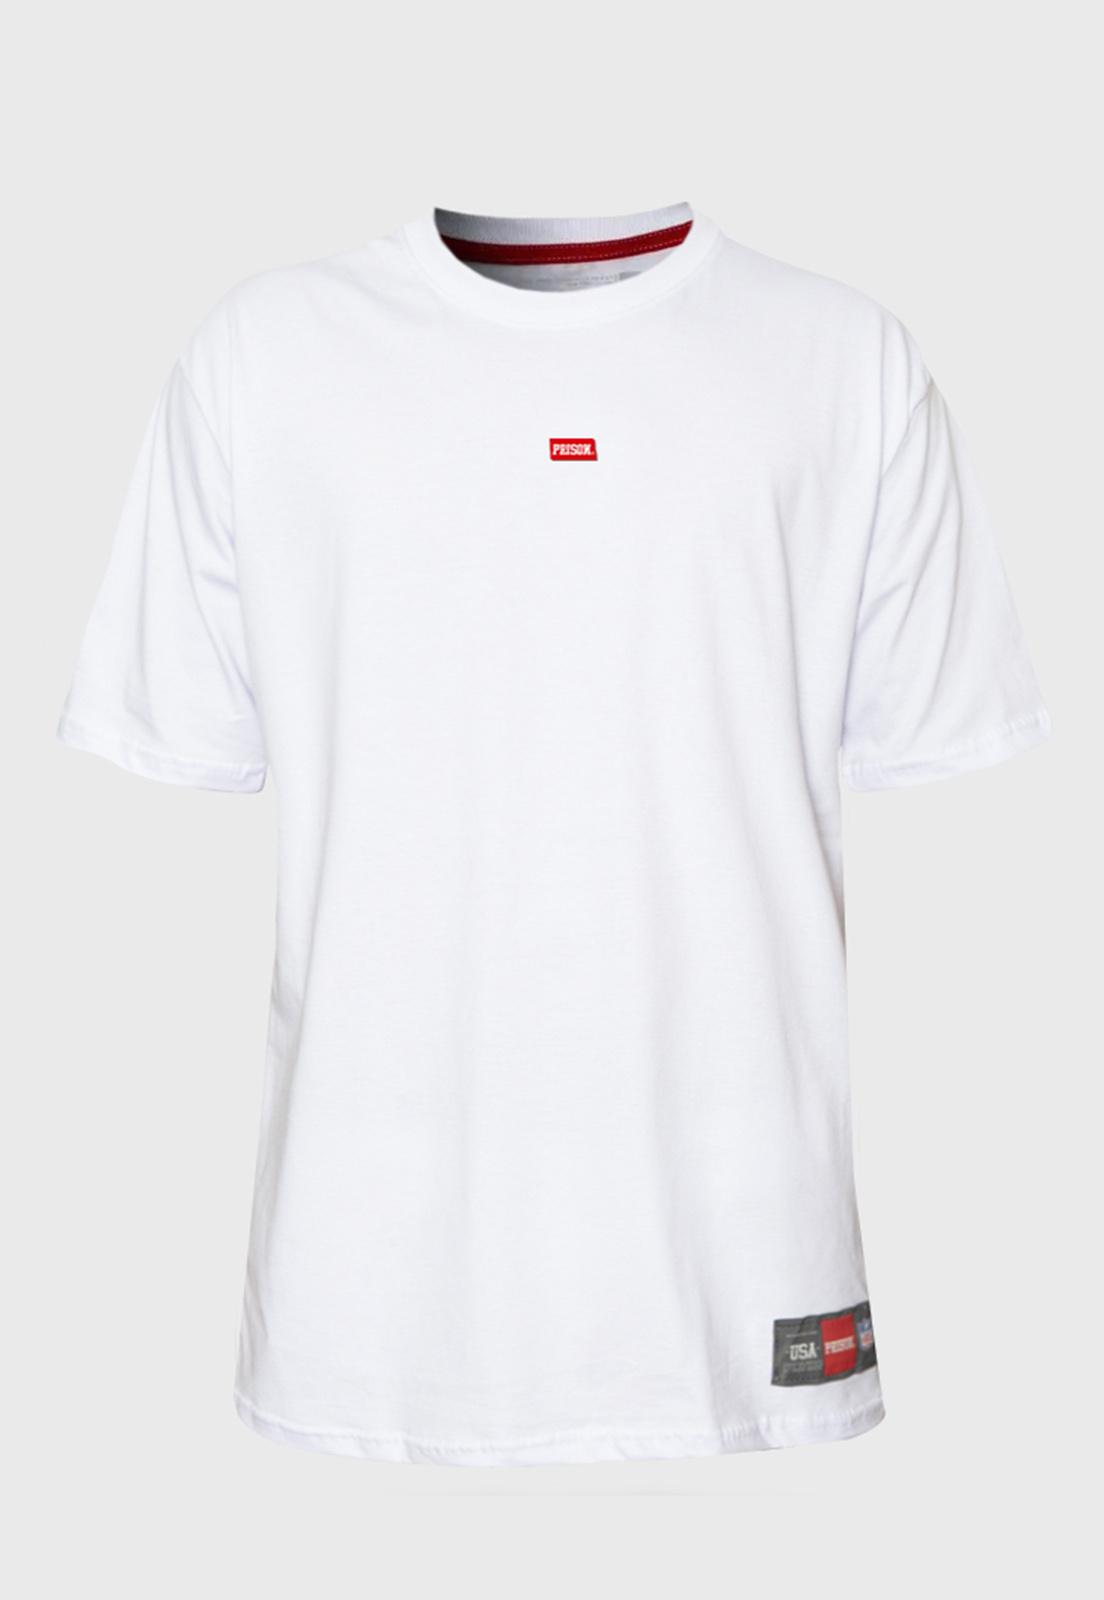 Camiseta Prison The minimalist Branco